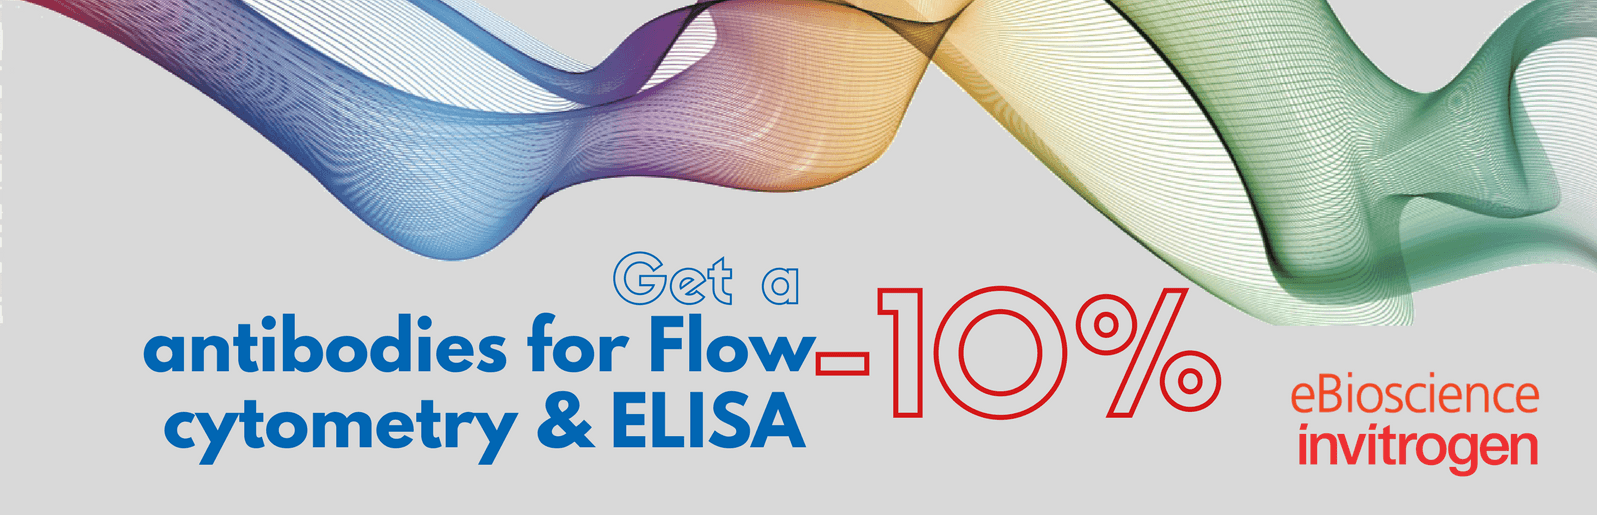 discount, antibodies, ELISA, flow citometry, promotion, offer, invitrogen, eBioscience,